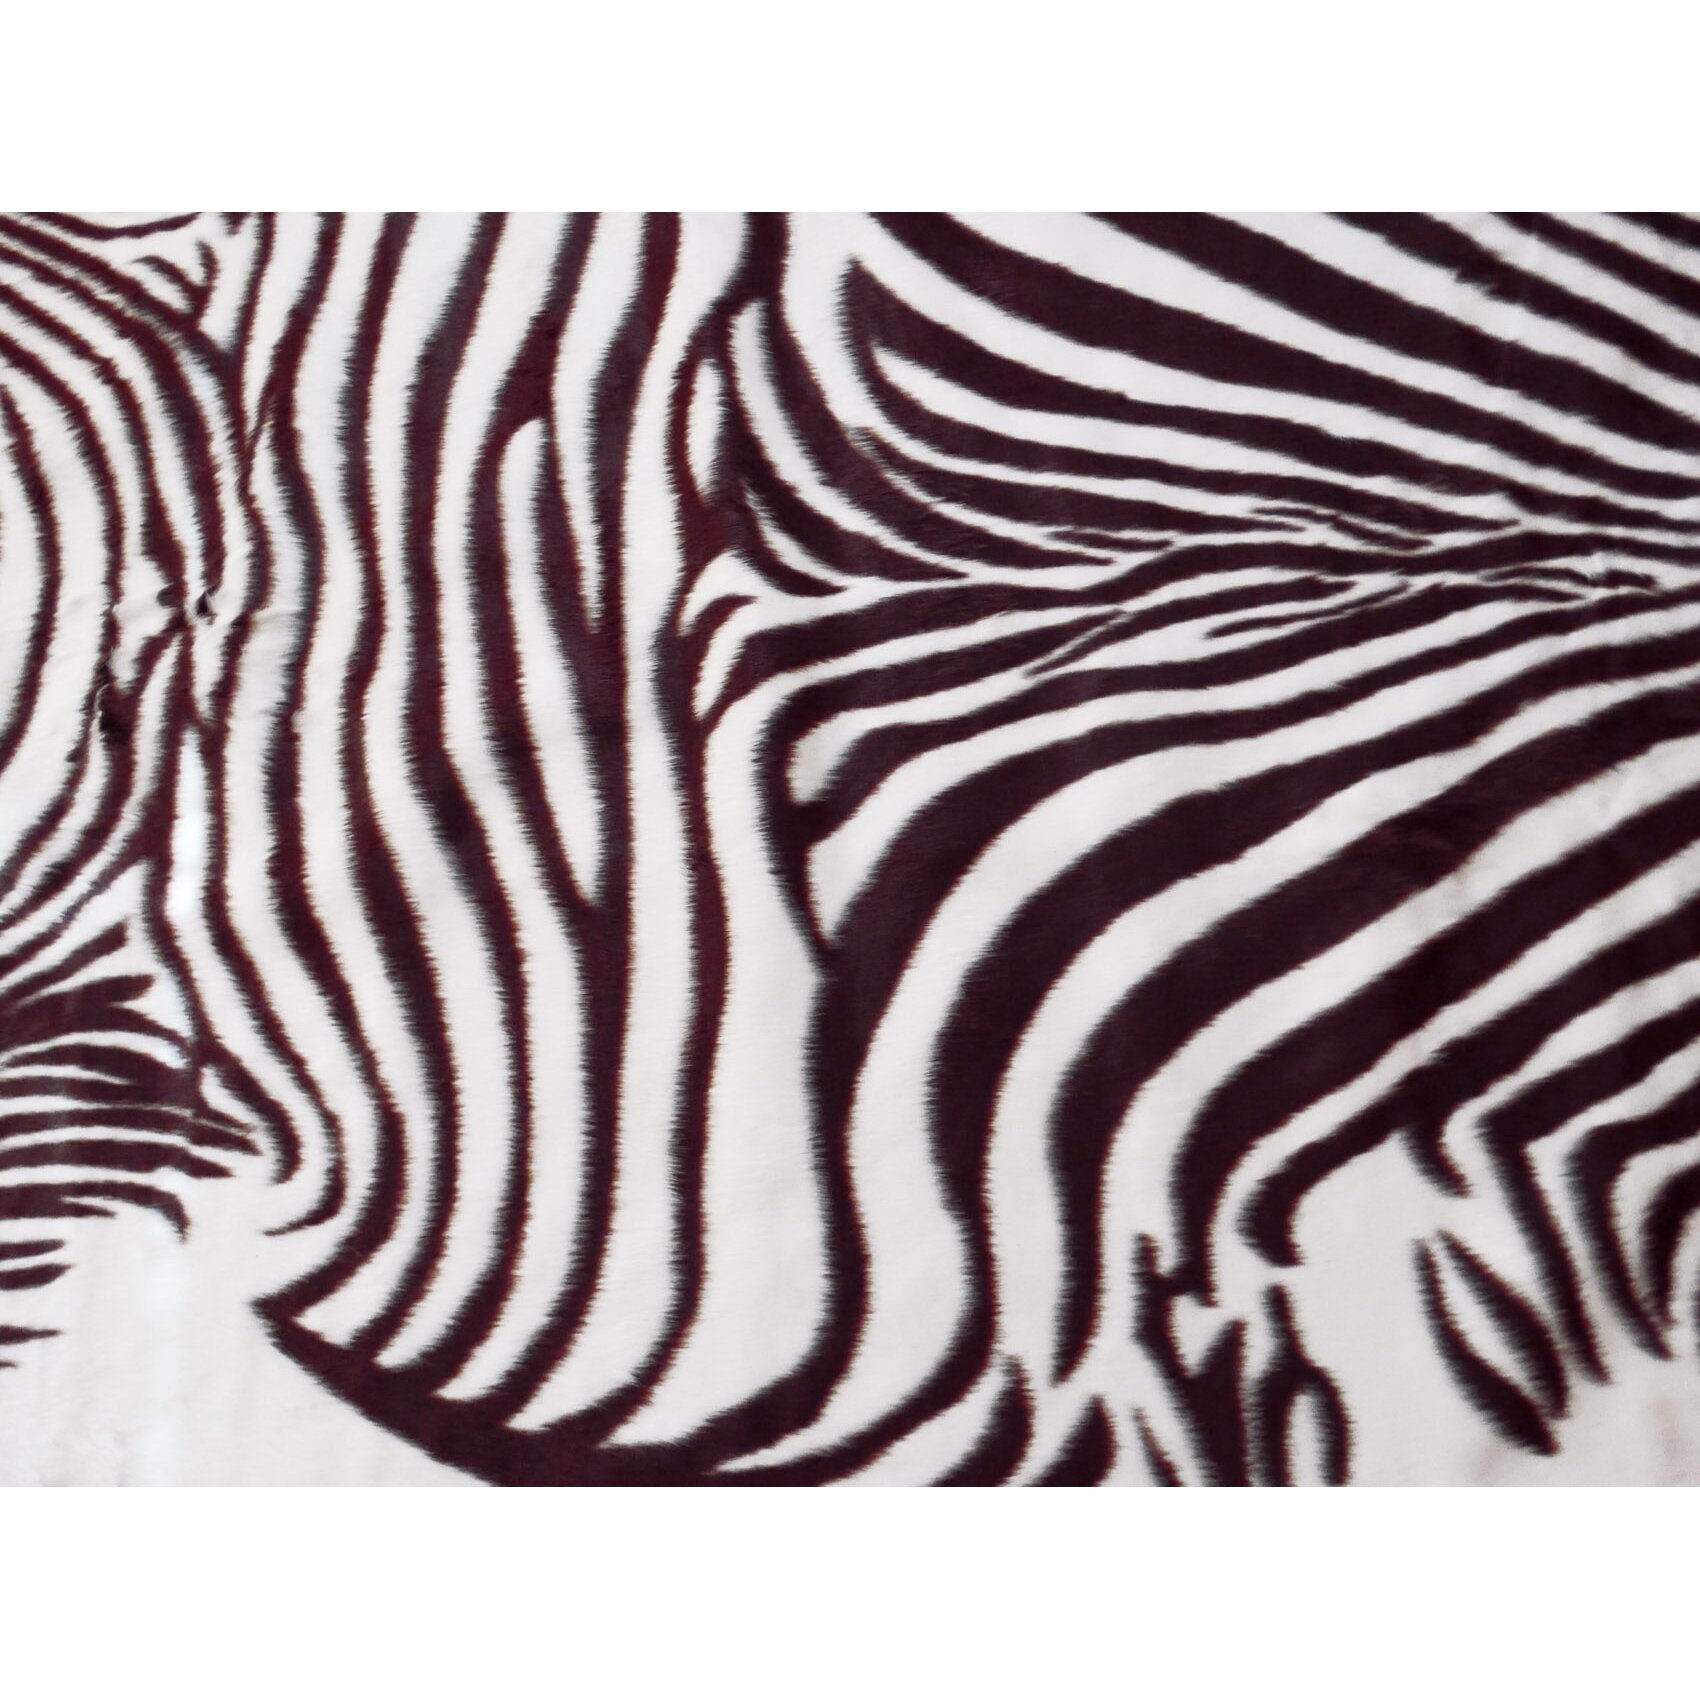 Acura rugs animal hide brown white zebra area rug for Zebra rug ikea